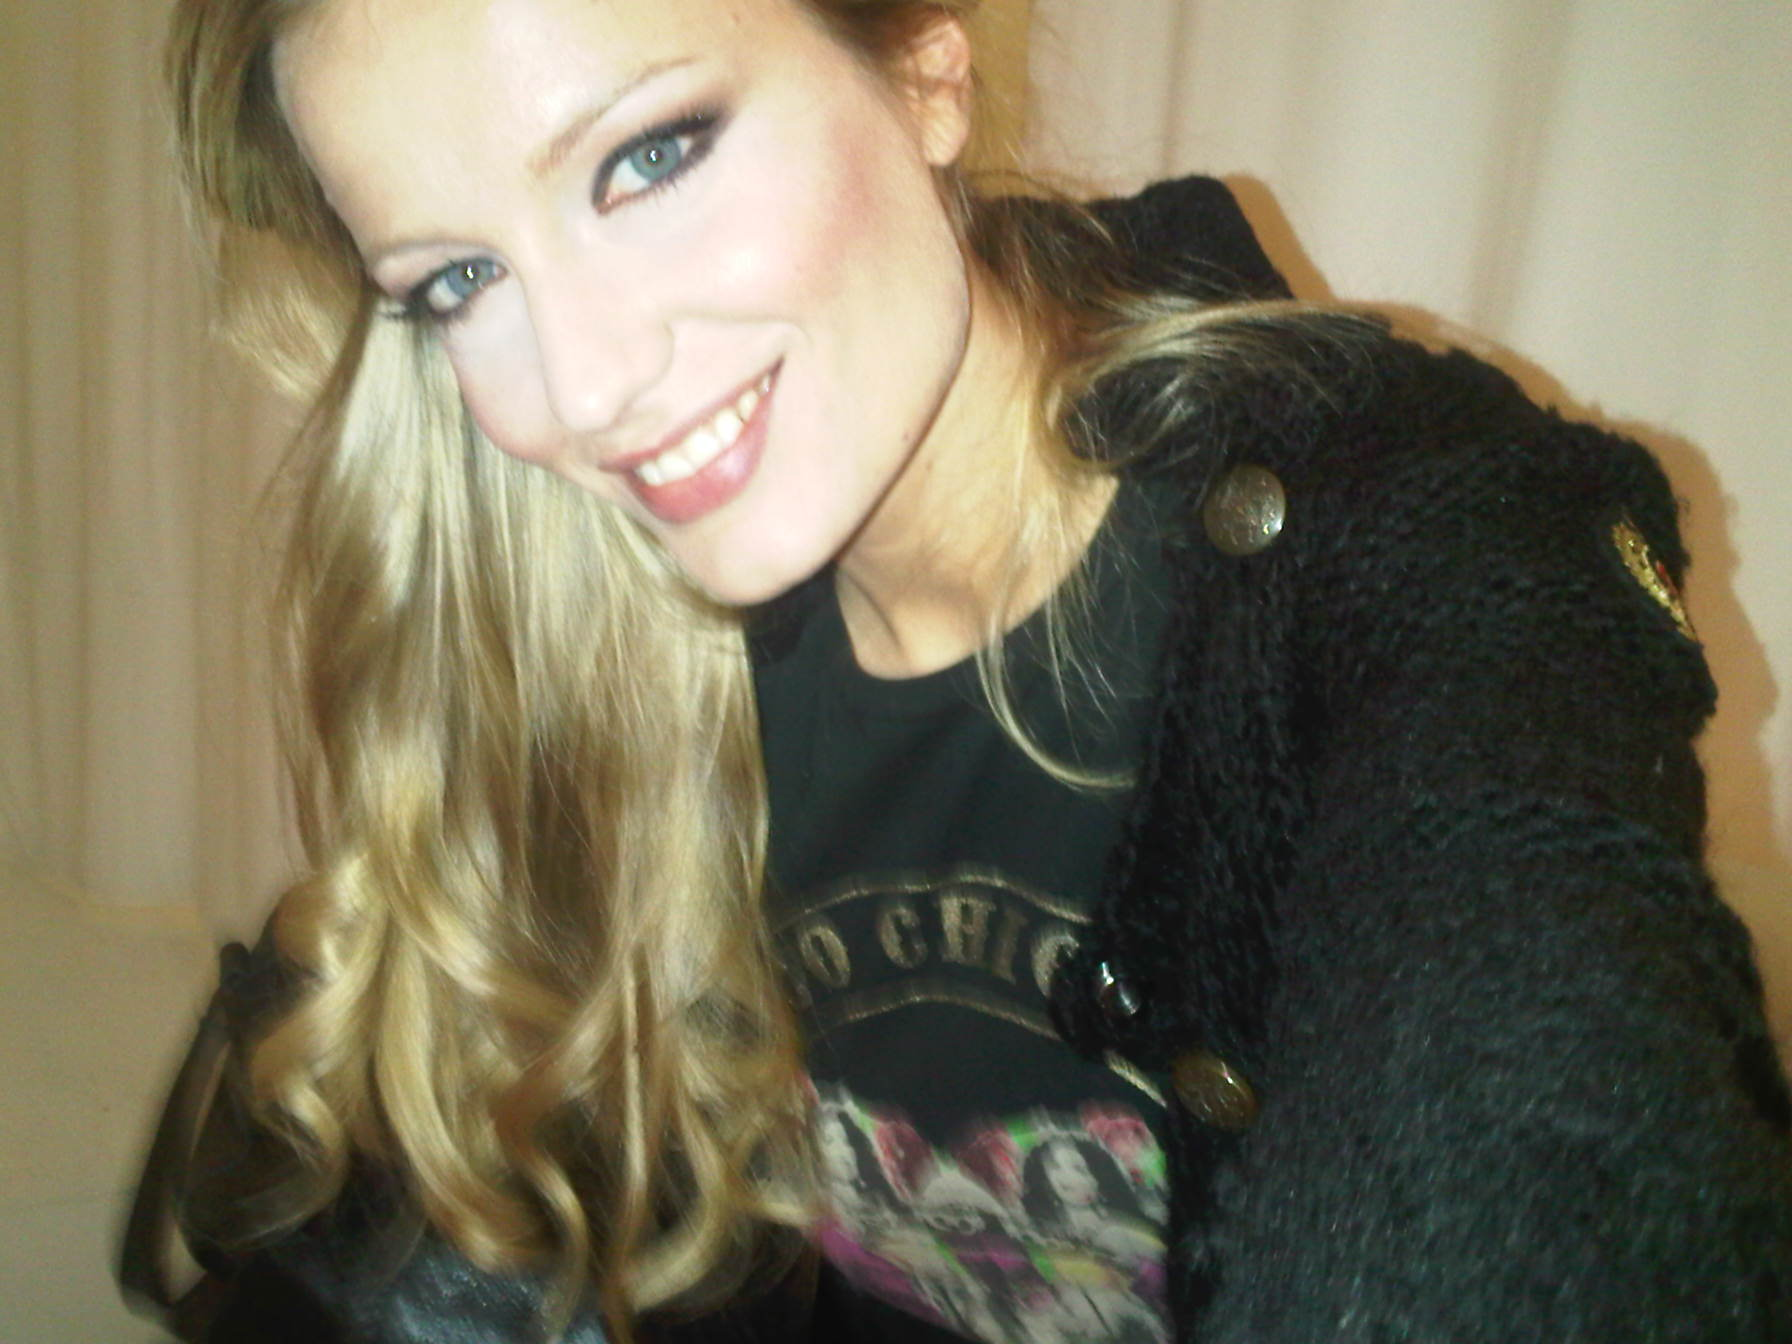 Renata Zanchi - Milano - This is the result, ready to film :-)